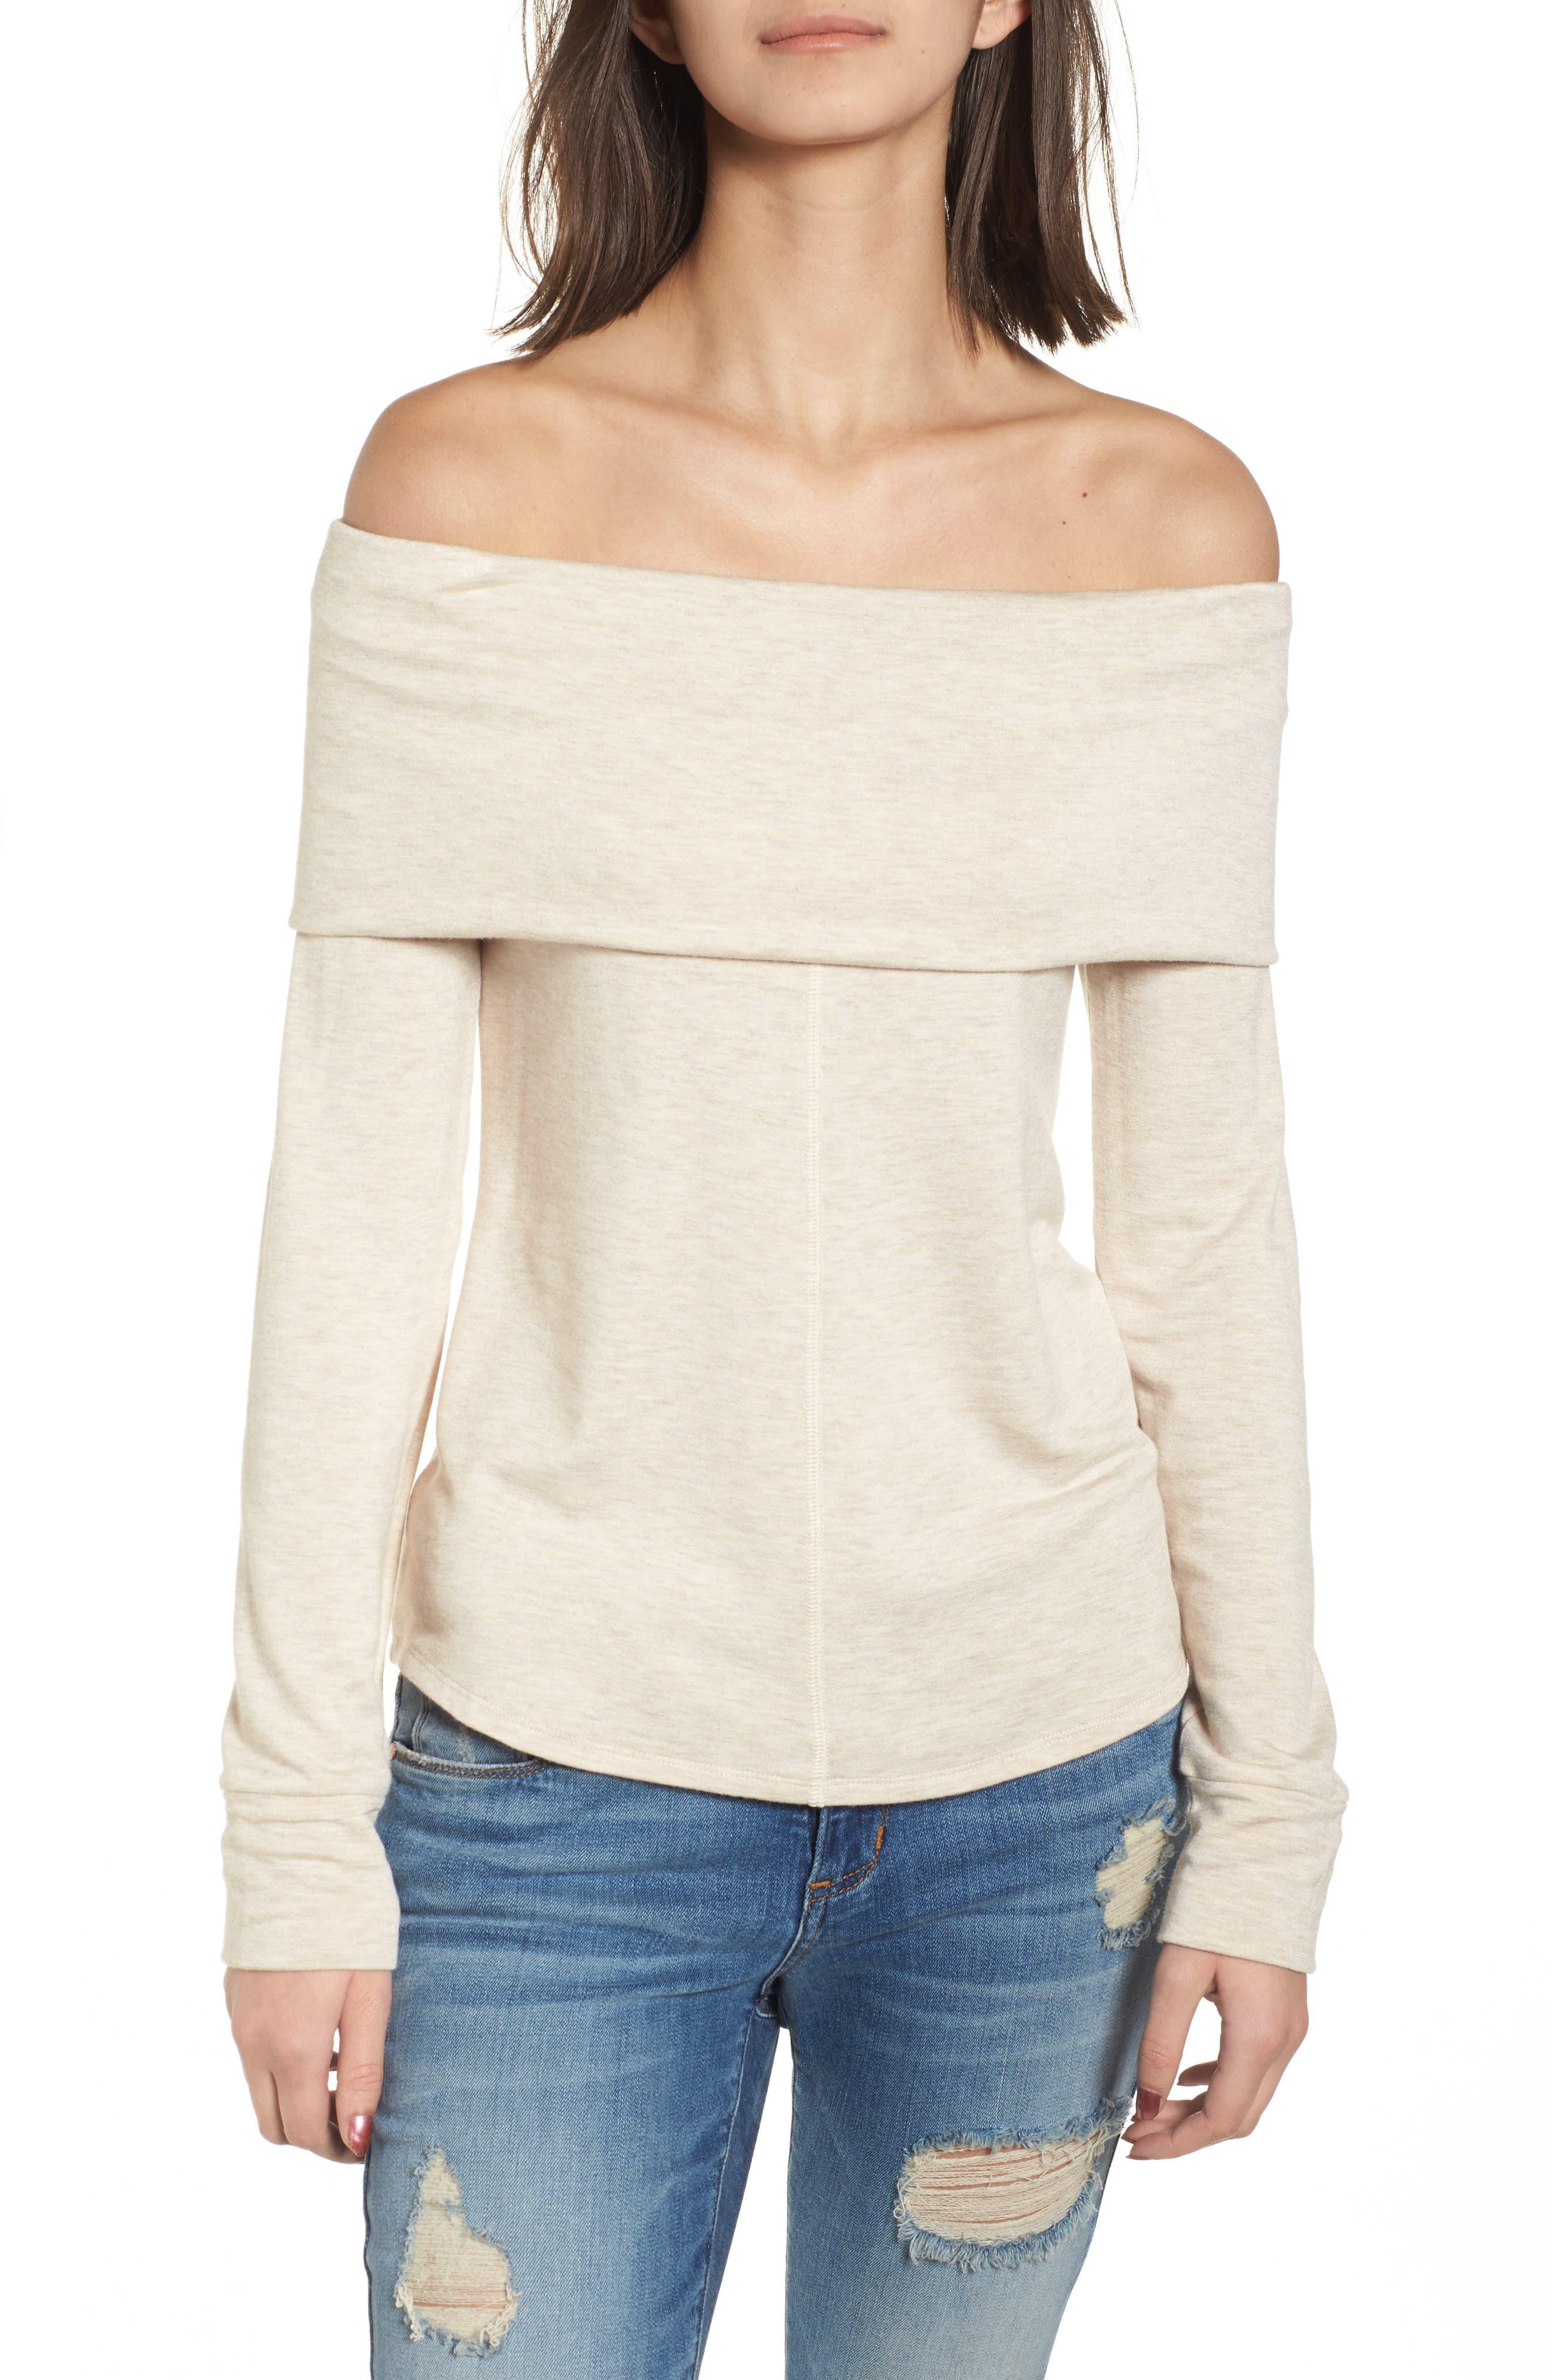 Alternate Image 1 Selected - Socialite Foldover Off the Shoulder Top